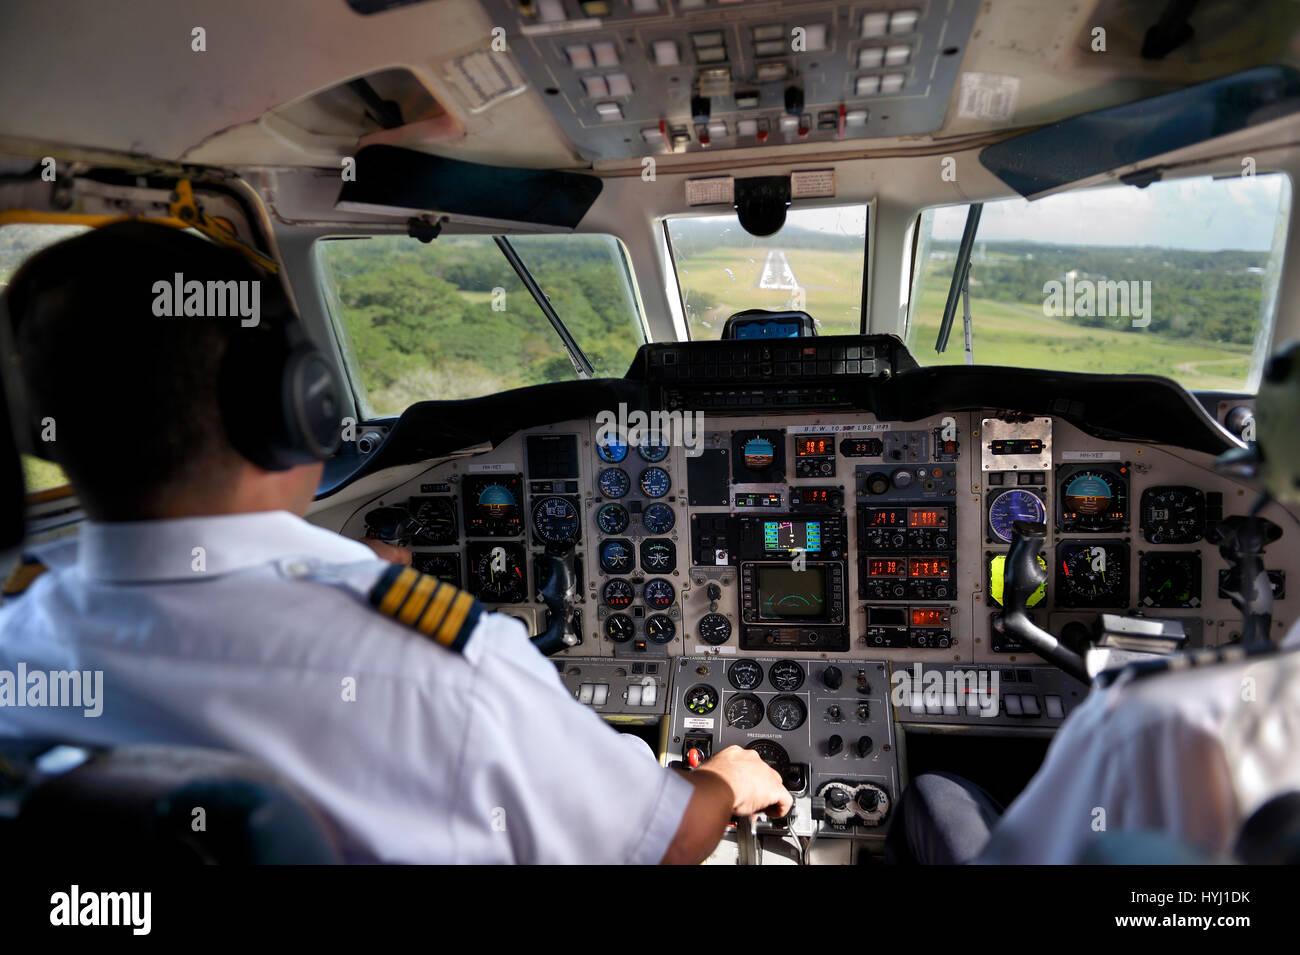 Landing, pilot and copilot control the twin-engine propeller aircraft British Aerospace Jetstream 3200, La Isabela - Stock Image